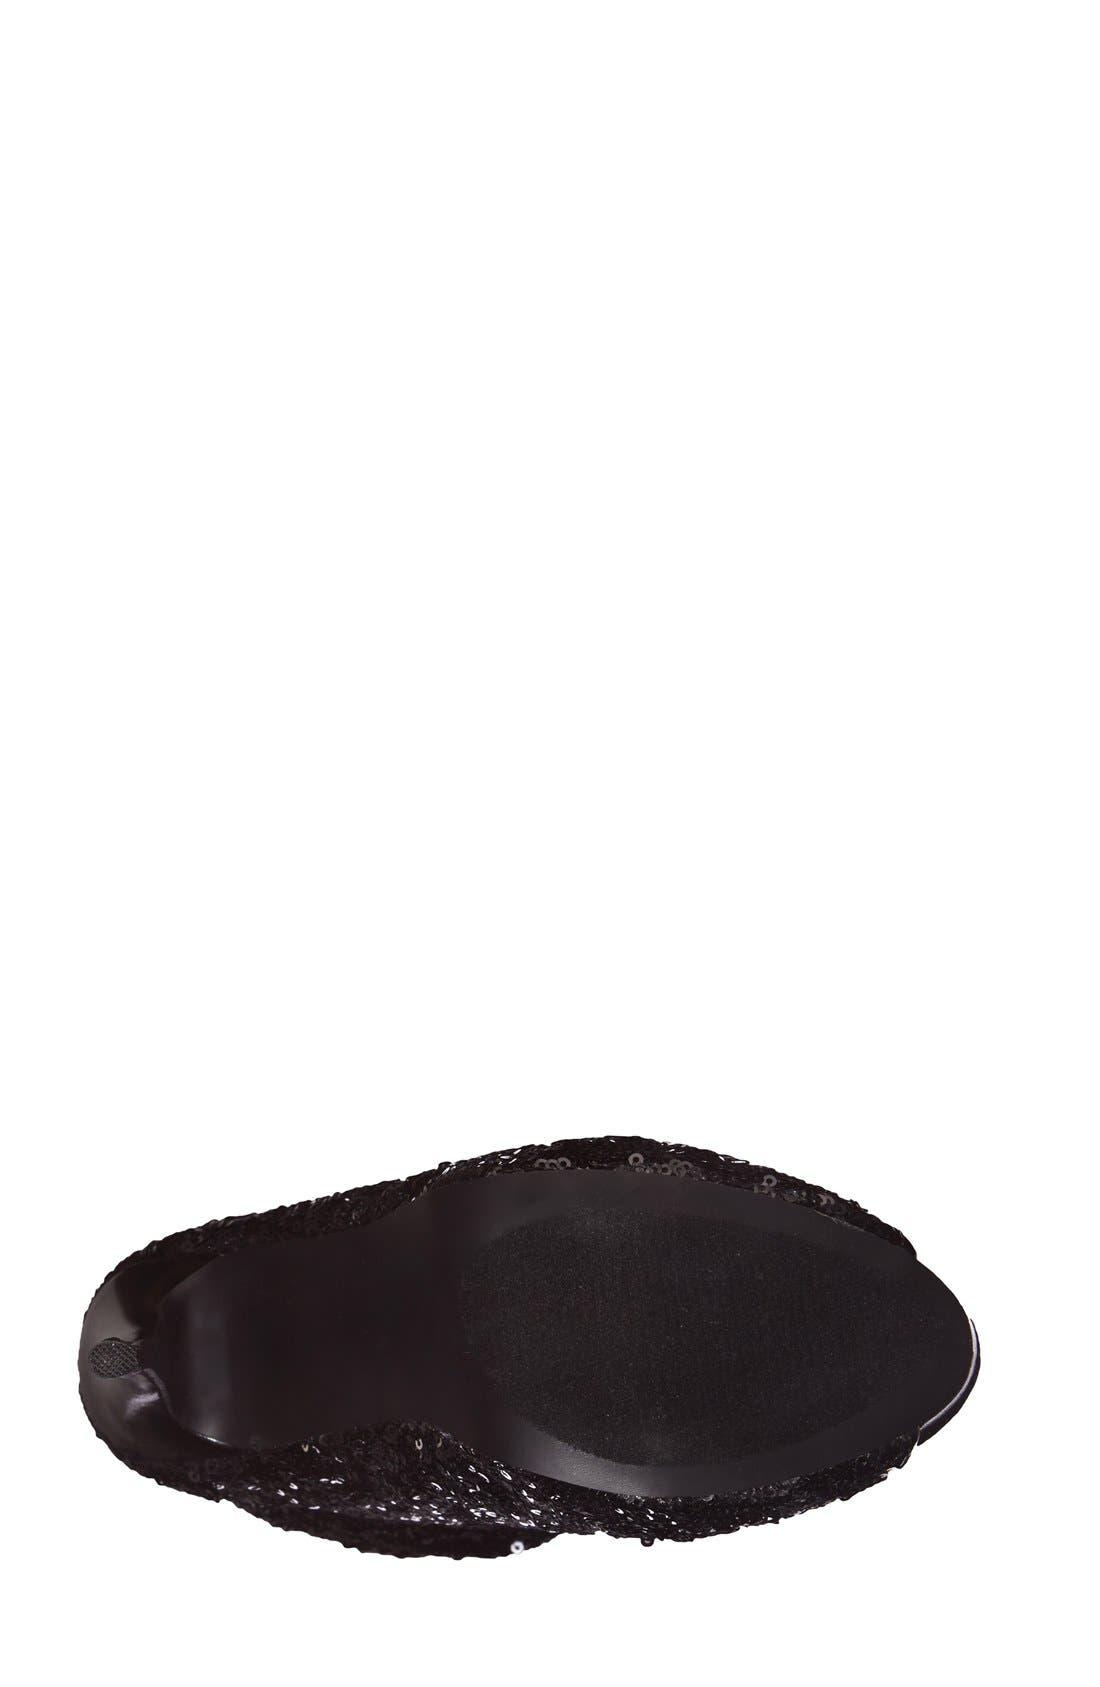 'Erin' Sequin Peep Toe Bootie,                             Alternate thumbnail 4, color,                             001